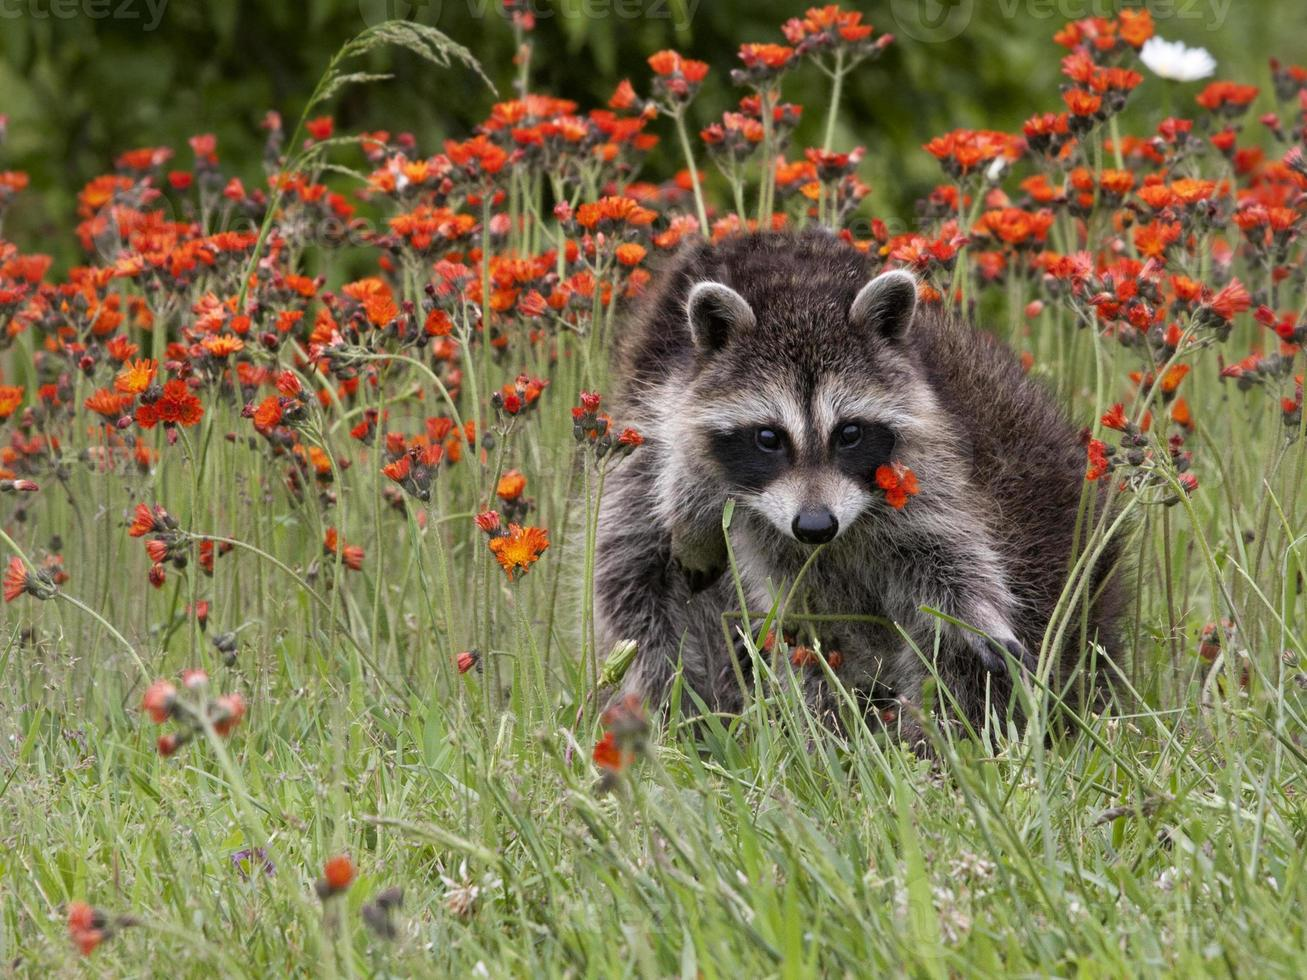 joven mapache posando en flores naranjas foto